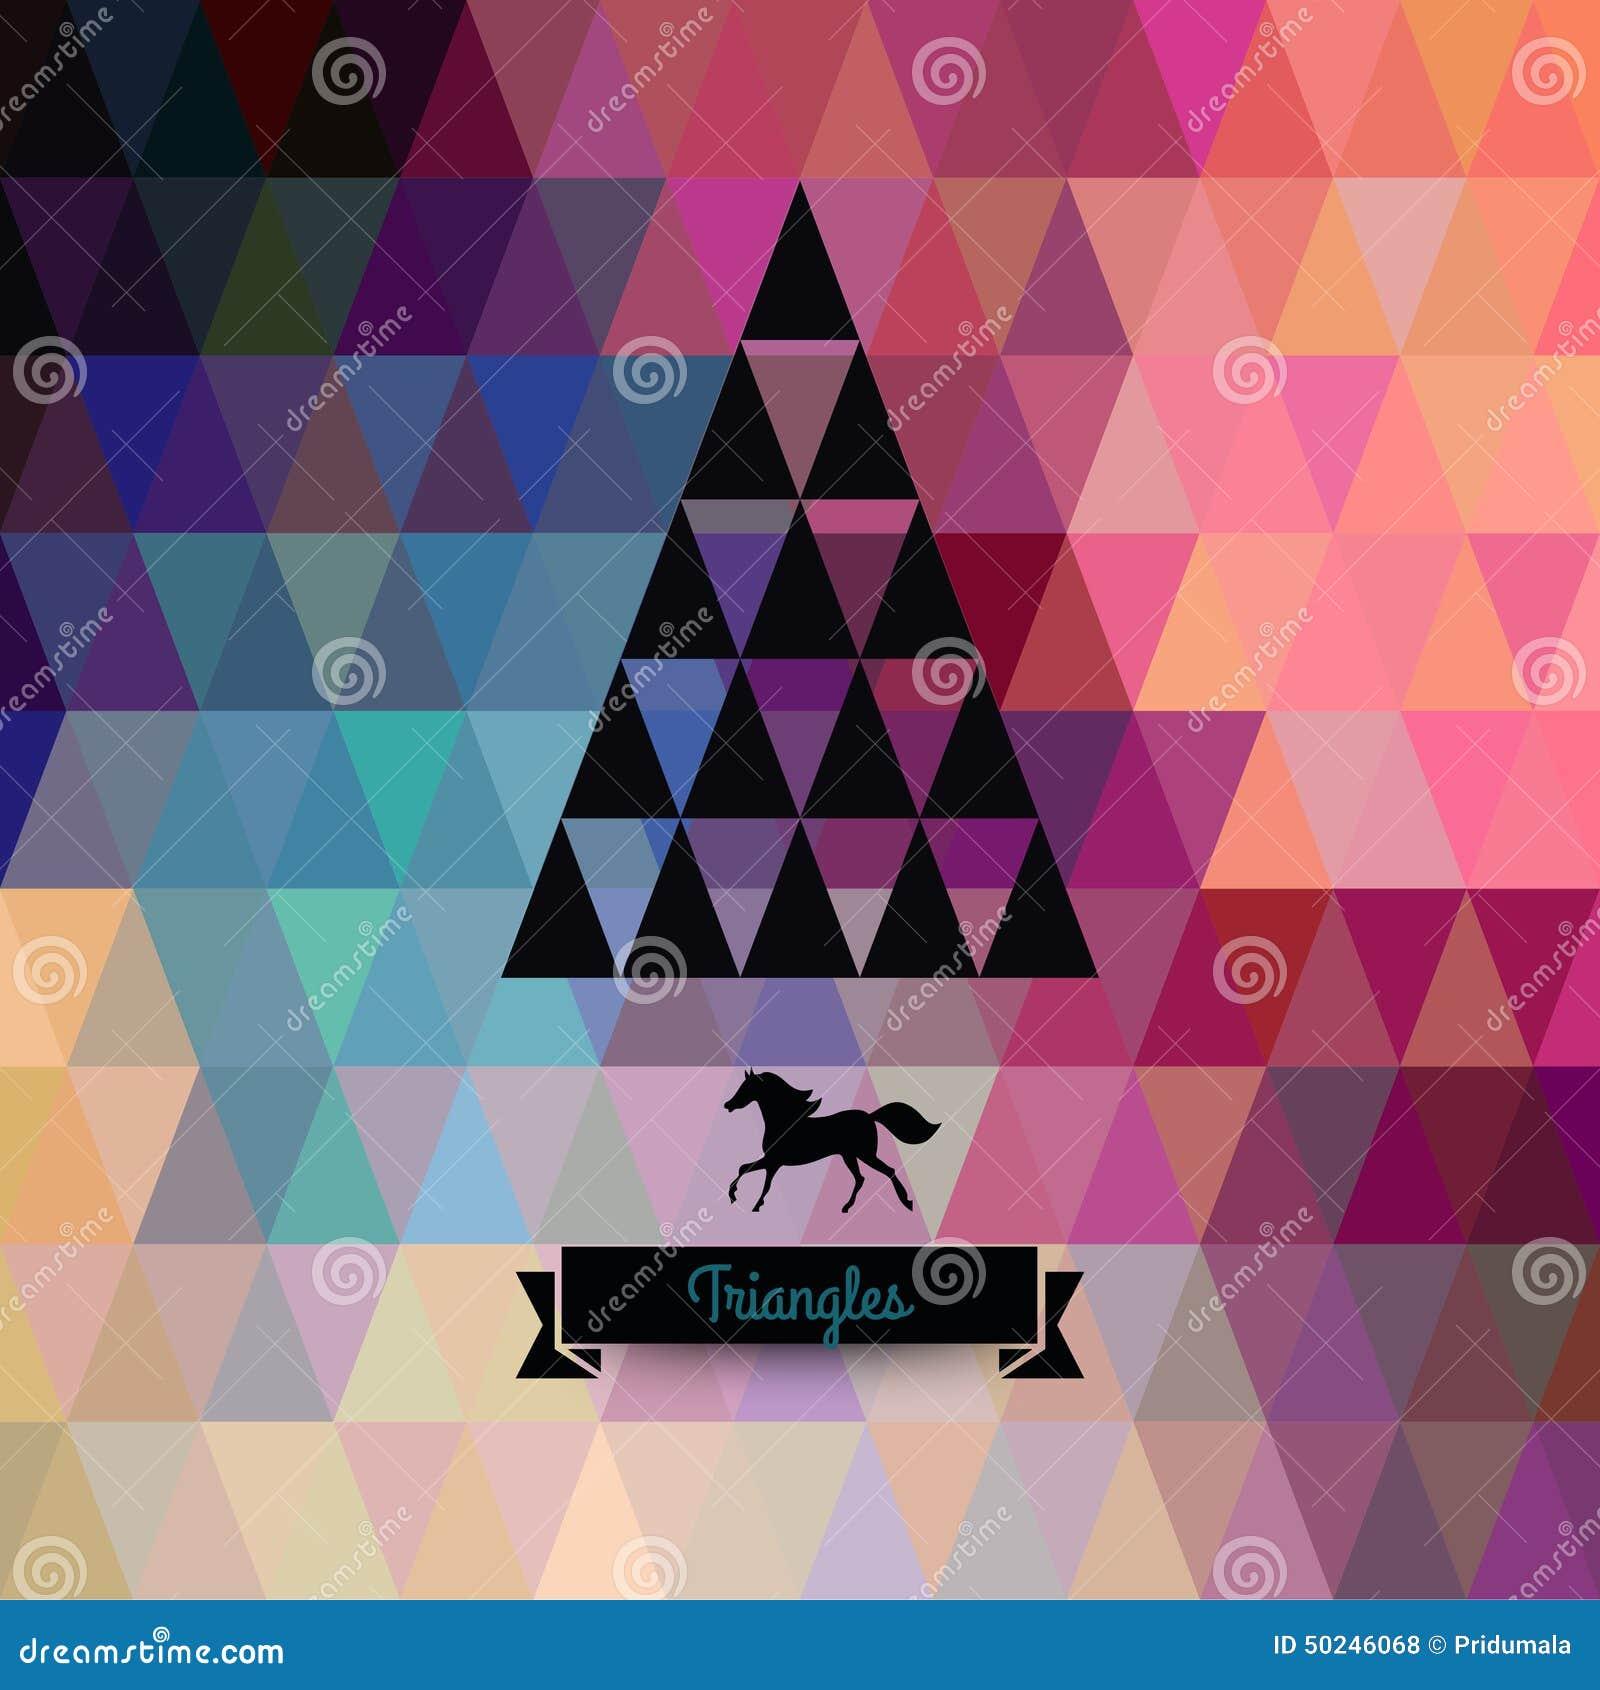 Ma Carte De Noel.Carte De Voeux De Noël De Vecteur Triangles Noël Ma Version